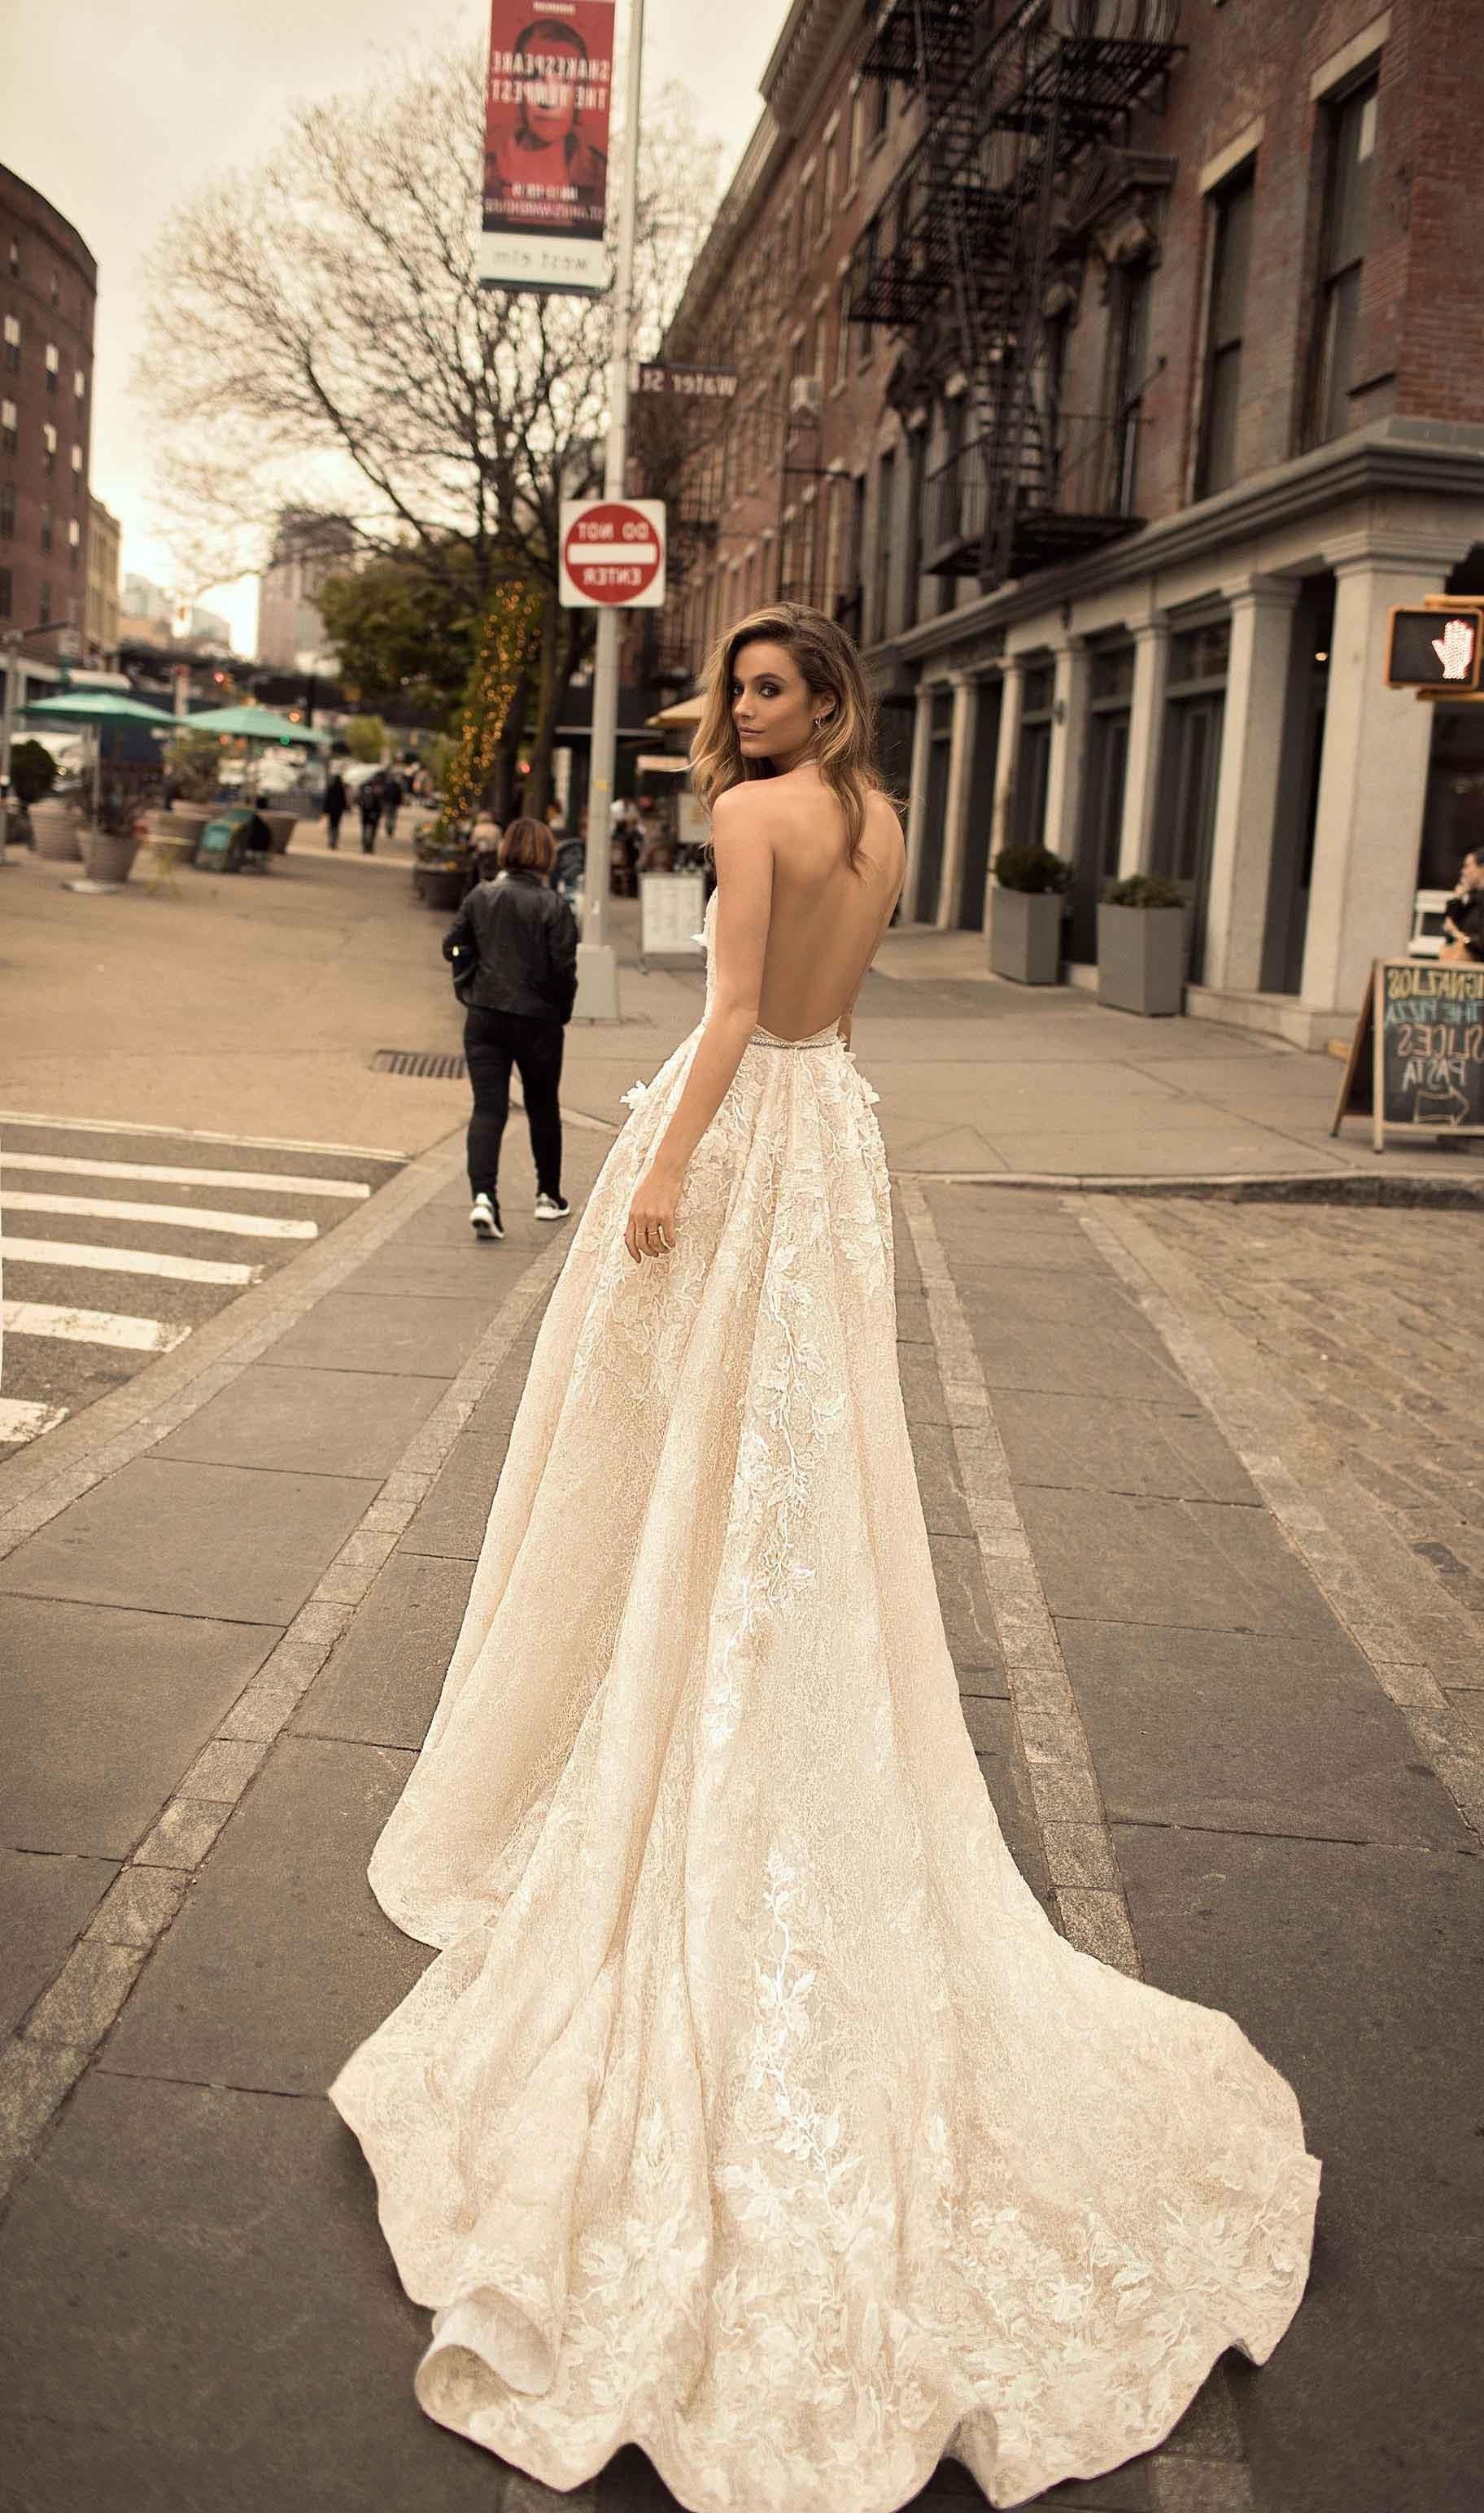 Ide Bridesmaid Hijab Styles Tqd3 Wedding Ideas White and Gold Wedding Dress Enchanting